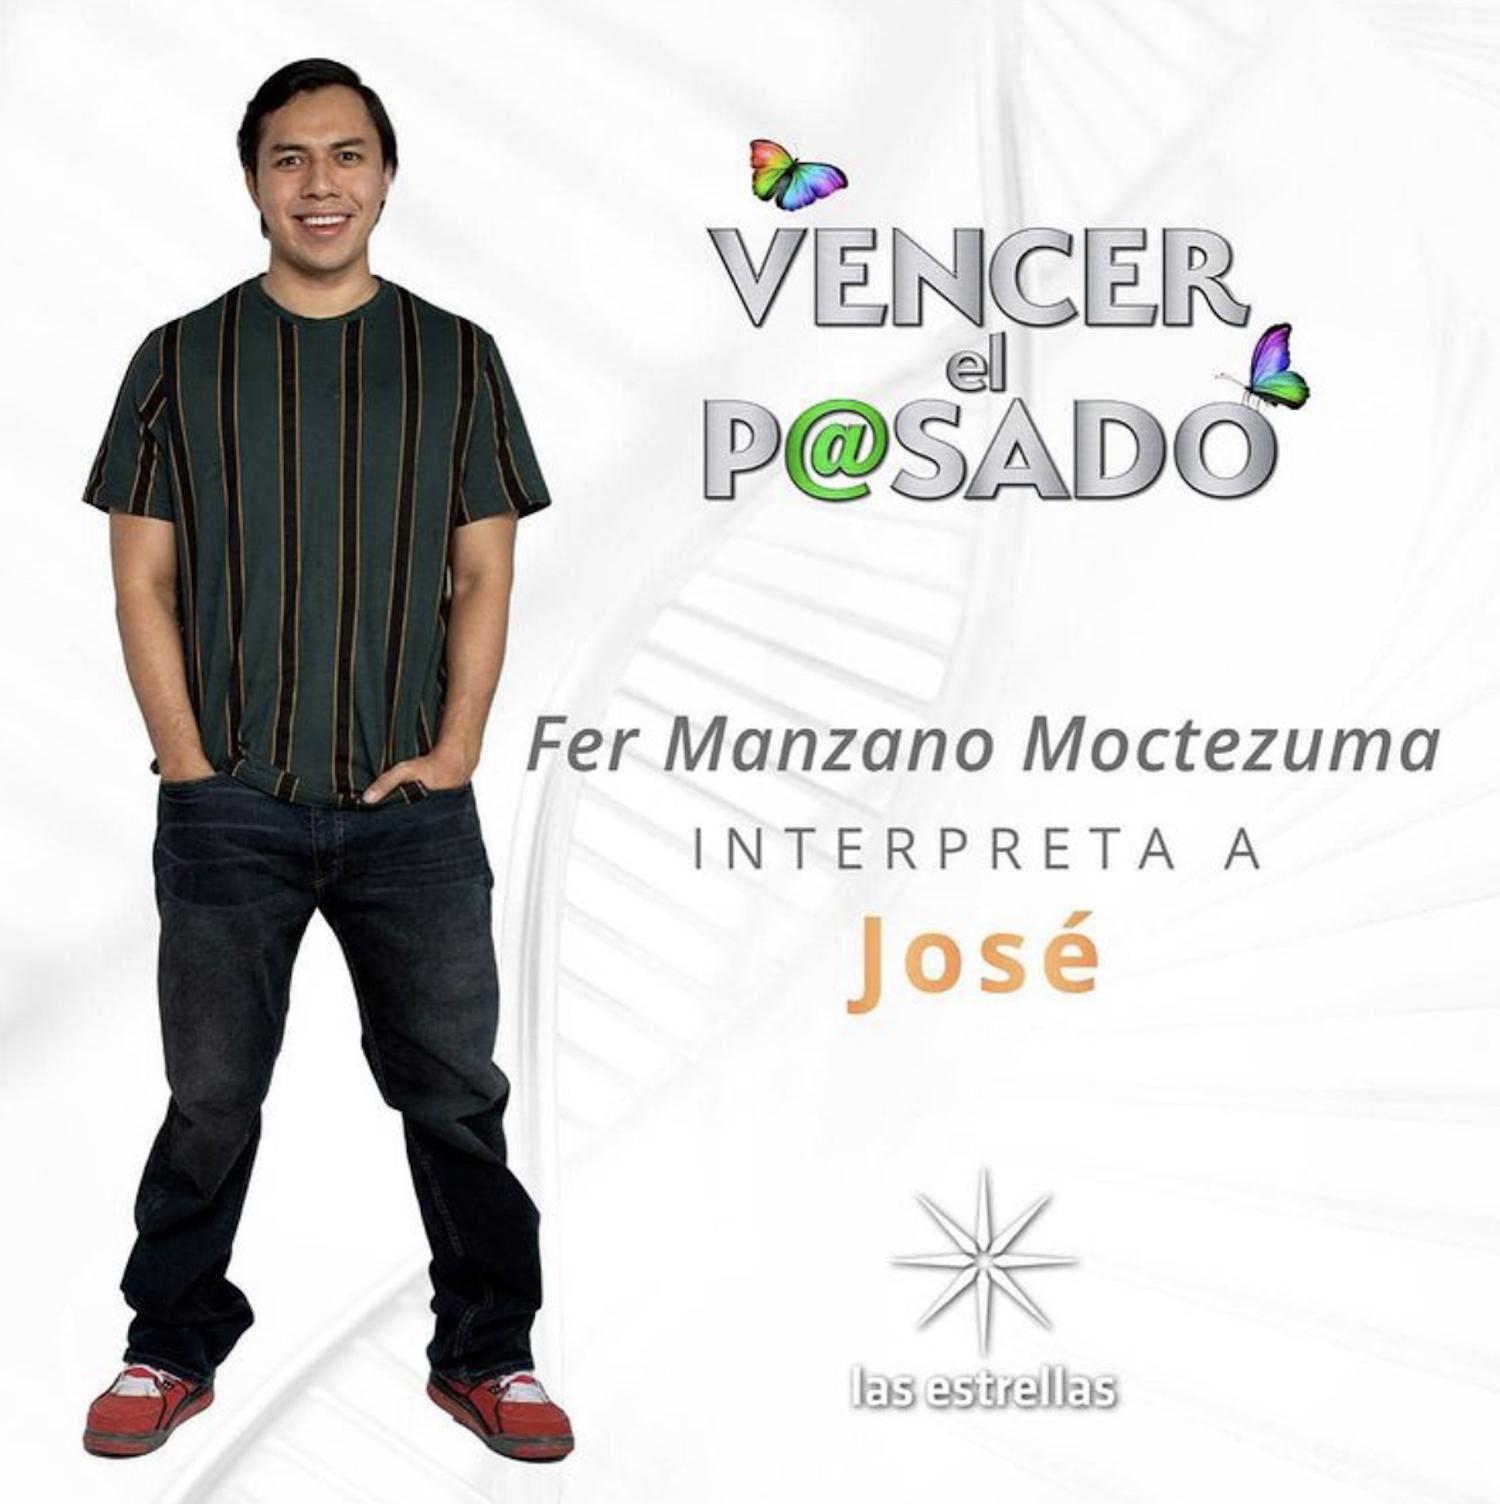 Fer Manzano